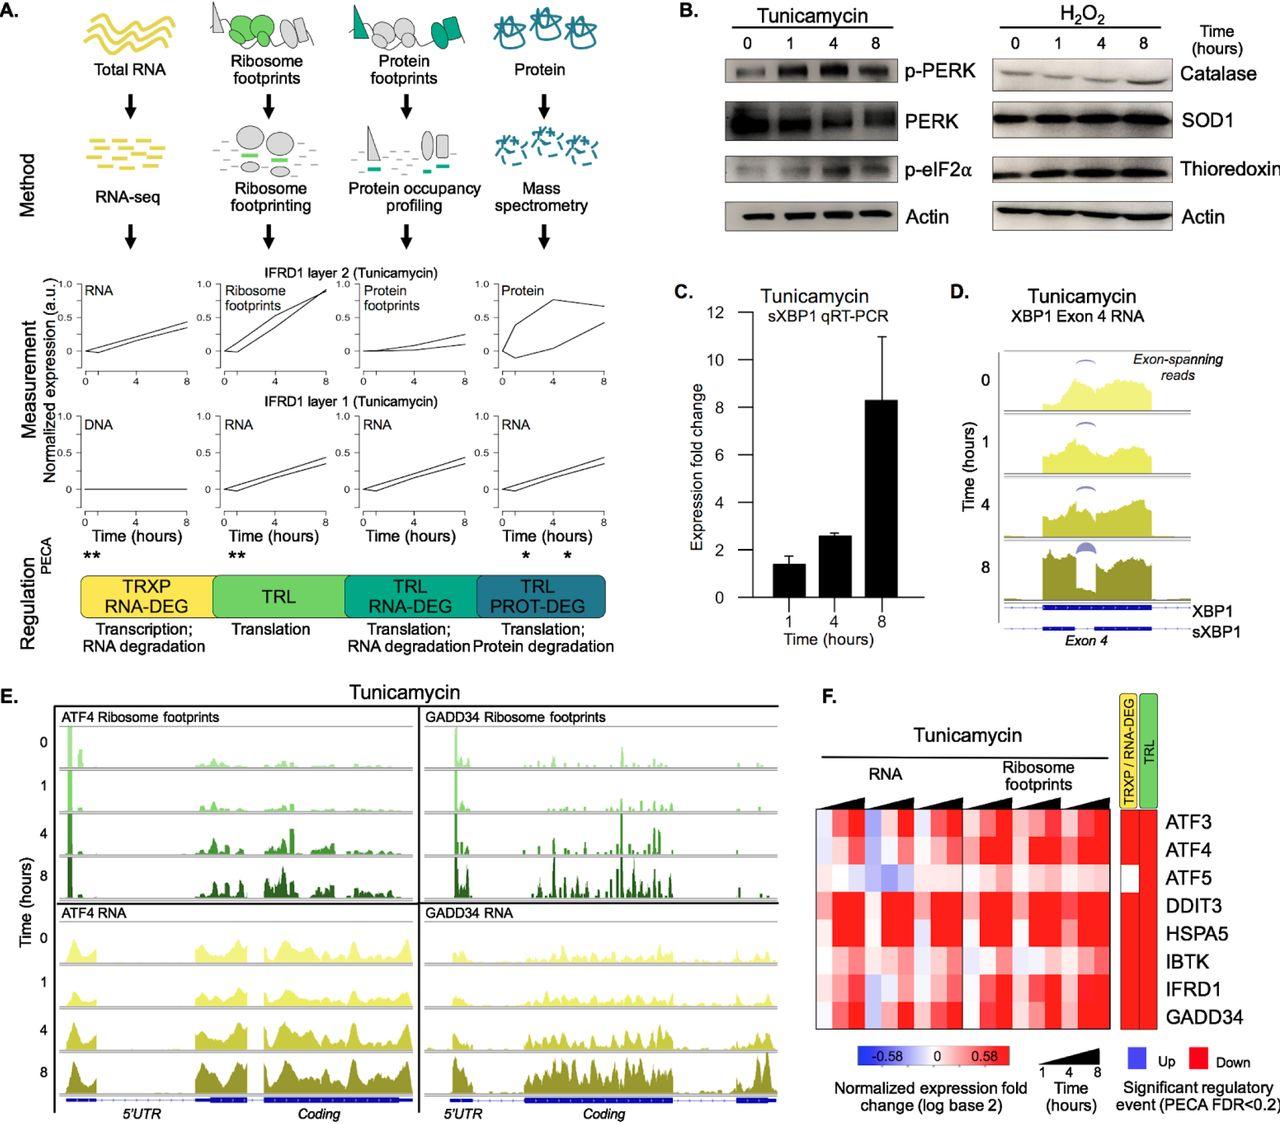 Quantifying multi-layered expression regulation in response